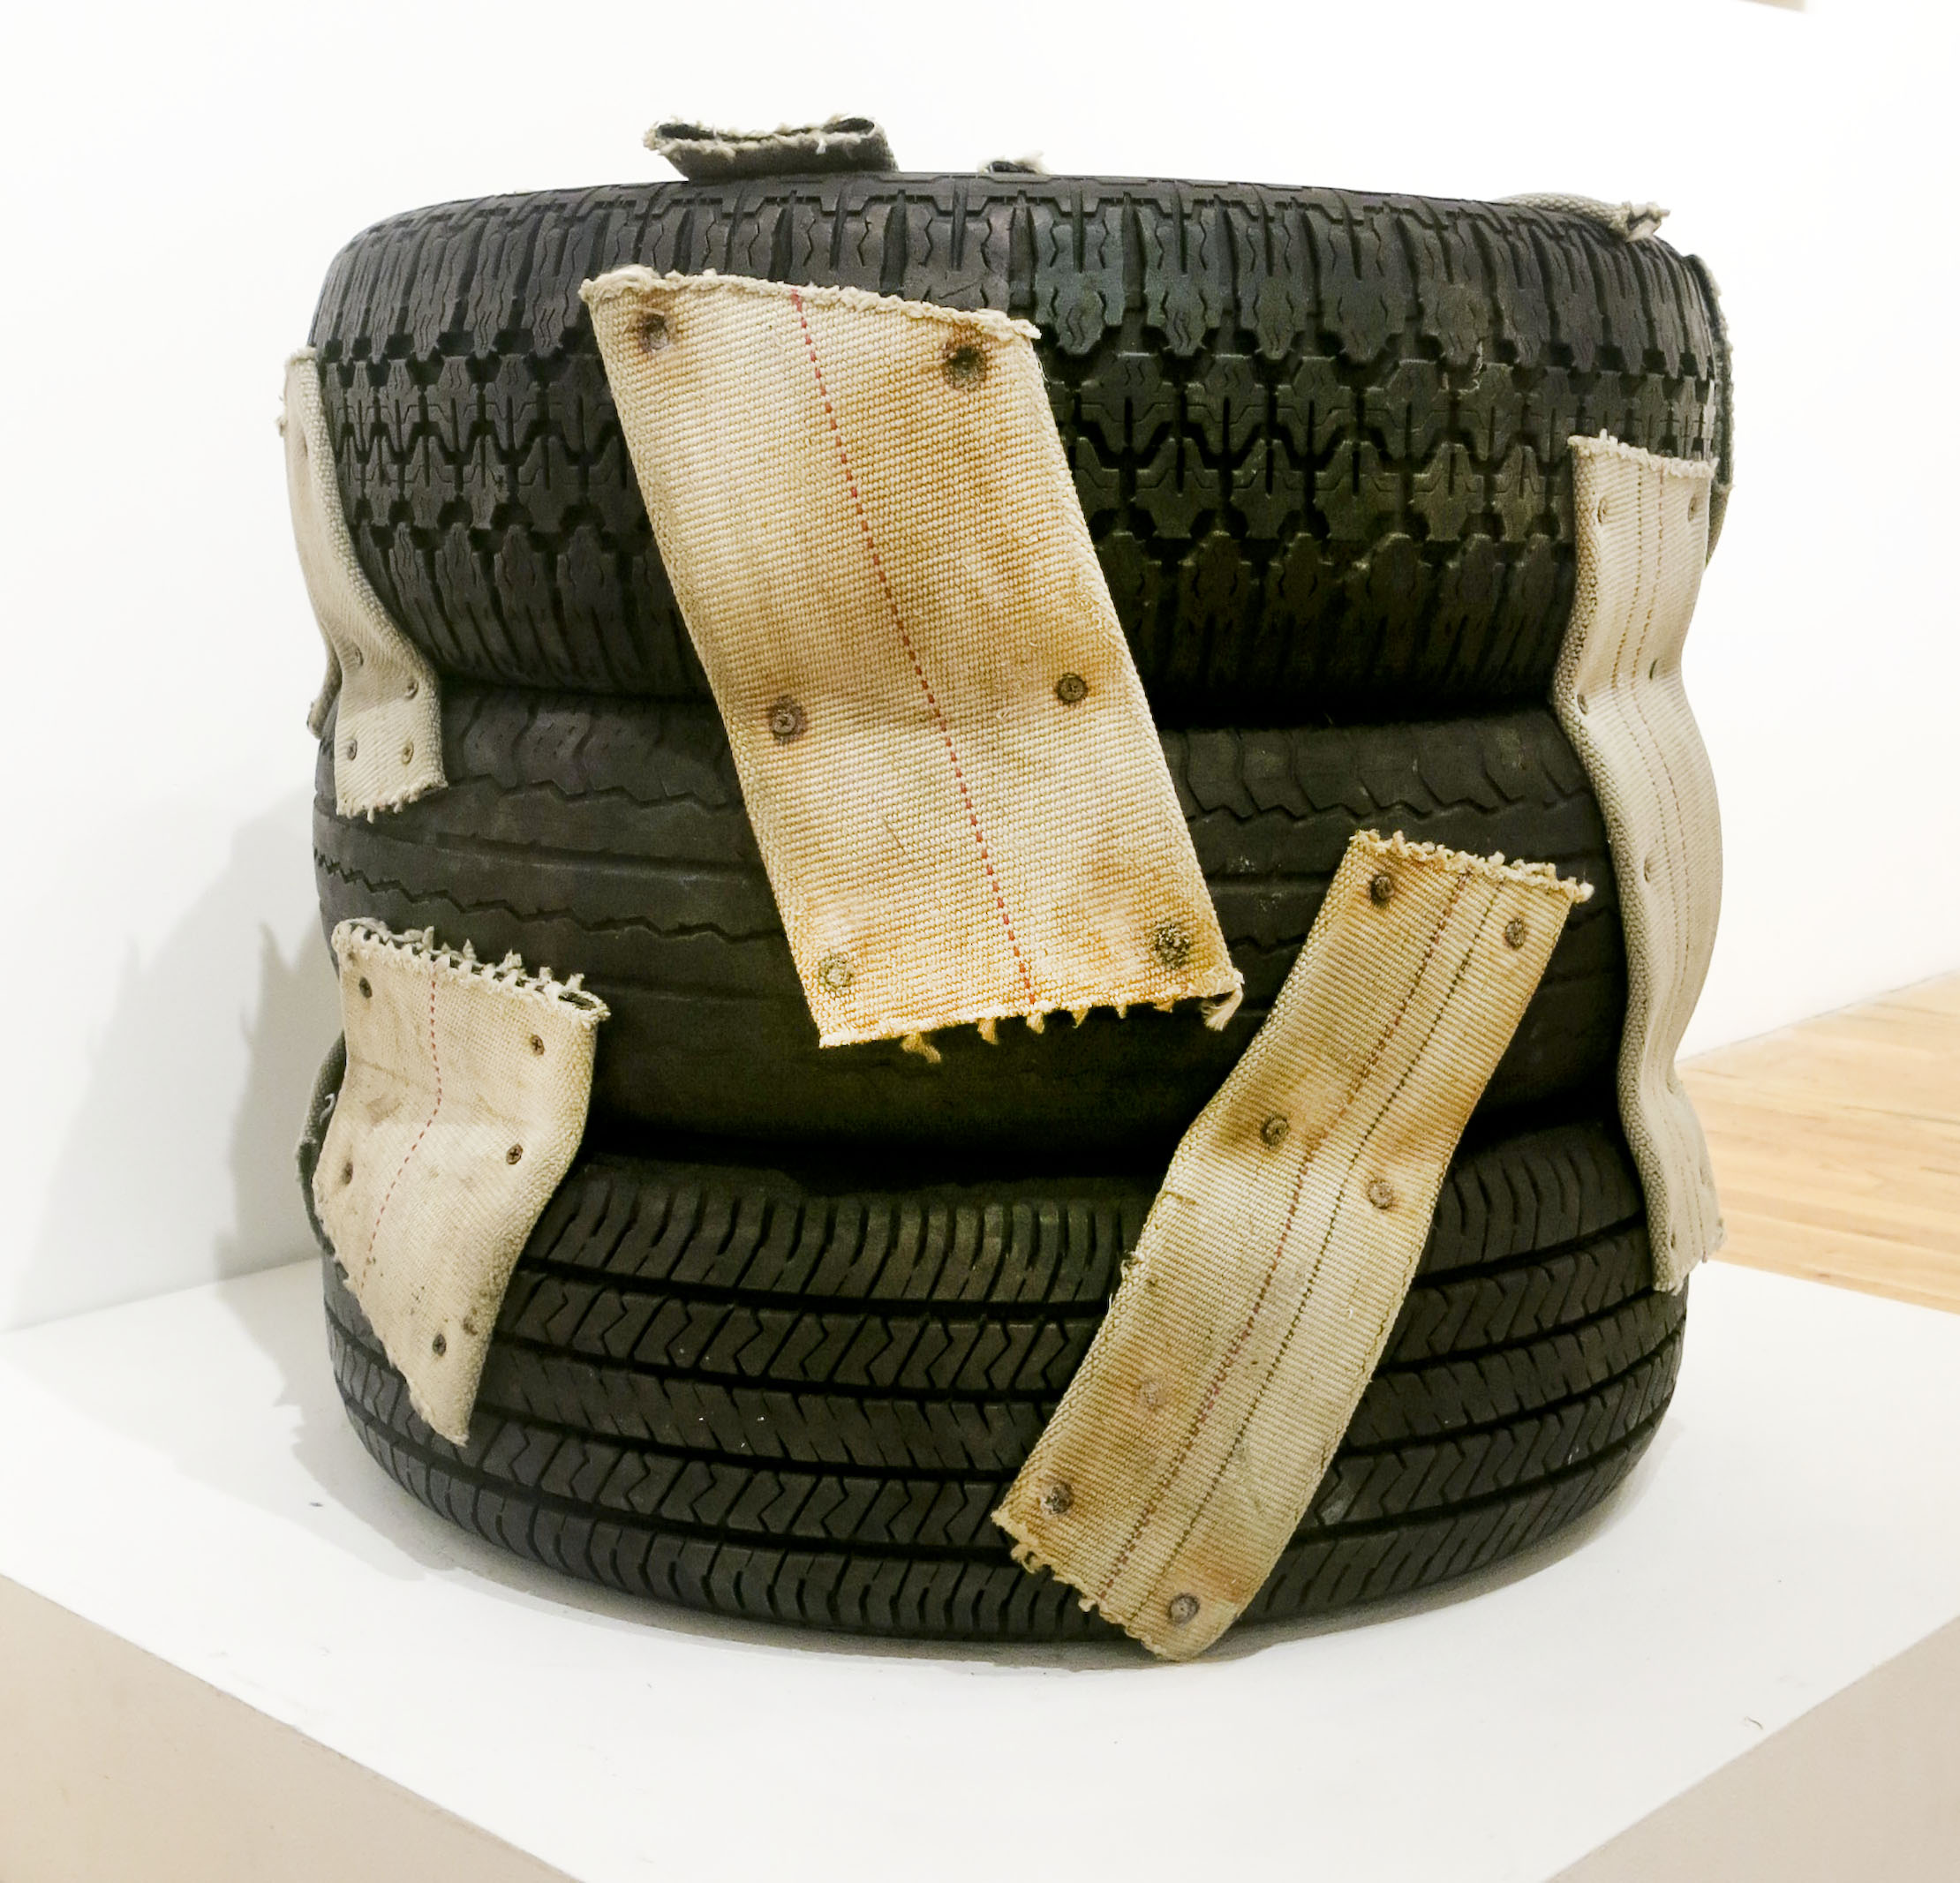 Nari Ward,  Nanny, Nanny, Nanny,  1993, tires, nylon straps, and dry wall screws, 23h x 26w x 26d in.